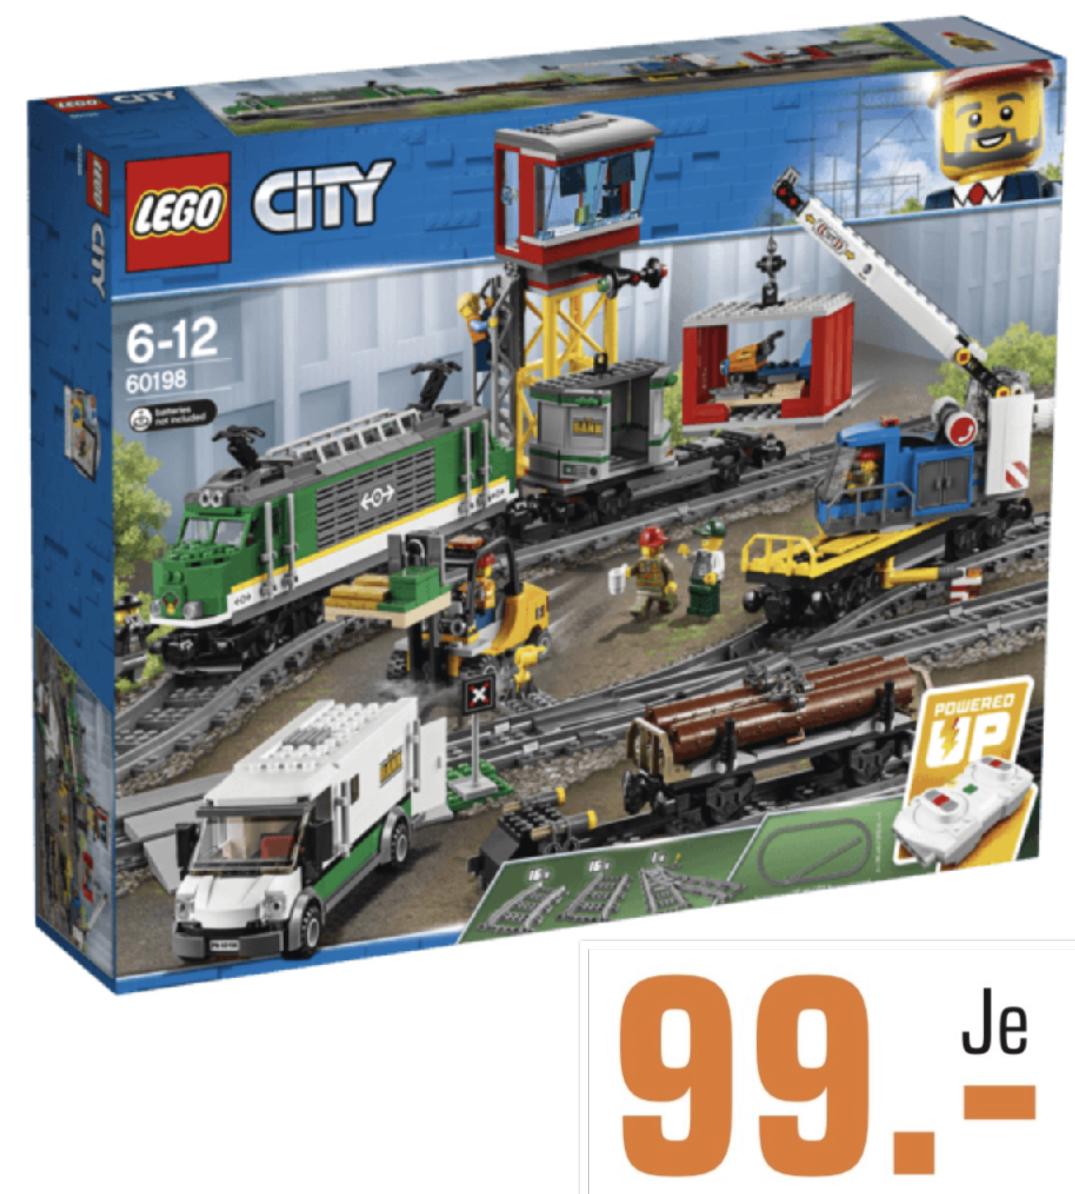 Lokal Saturn Chemnitz: LEGO City 60198 Güterzug für 99€